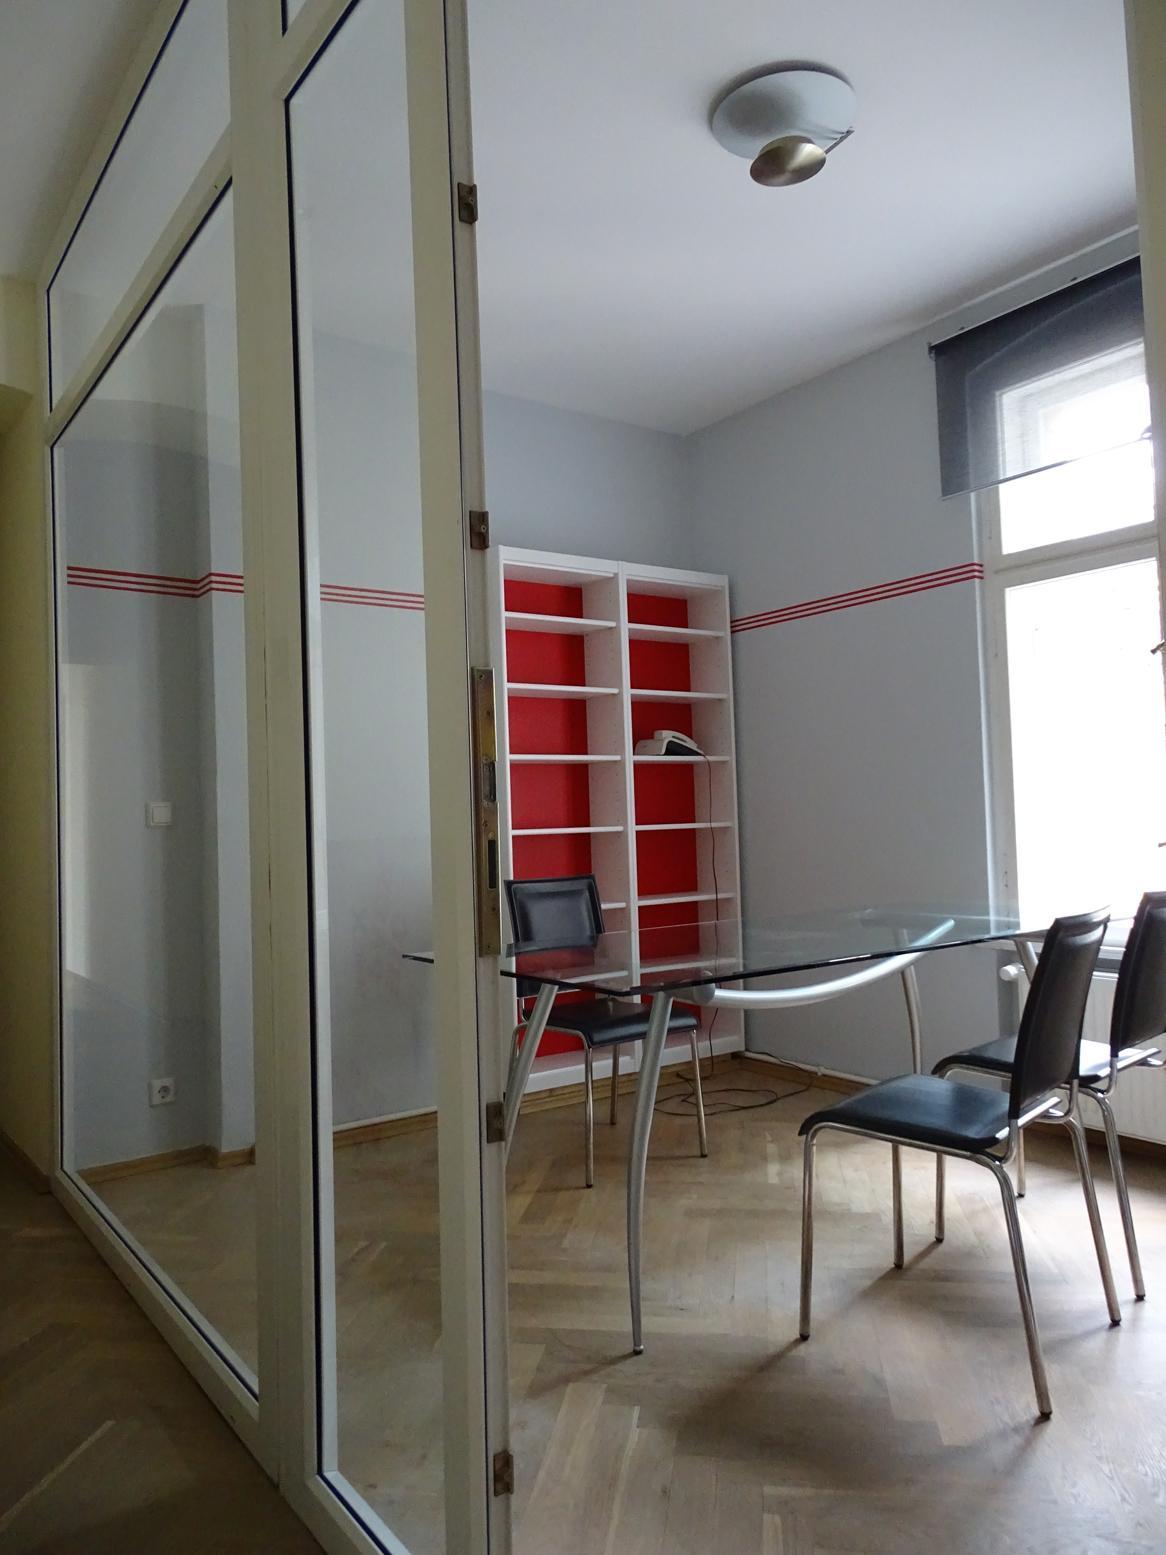 kleines büro mit roten farbakzenten #büro #arbeitszi